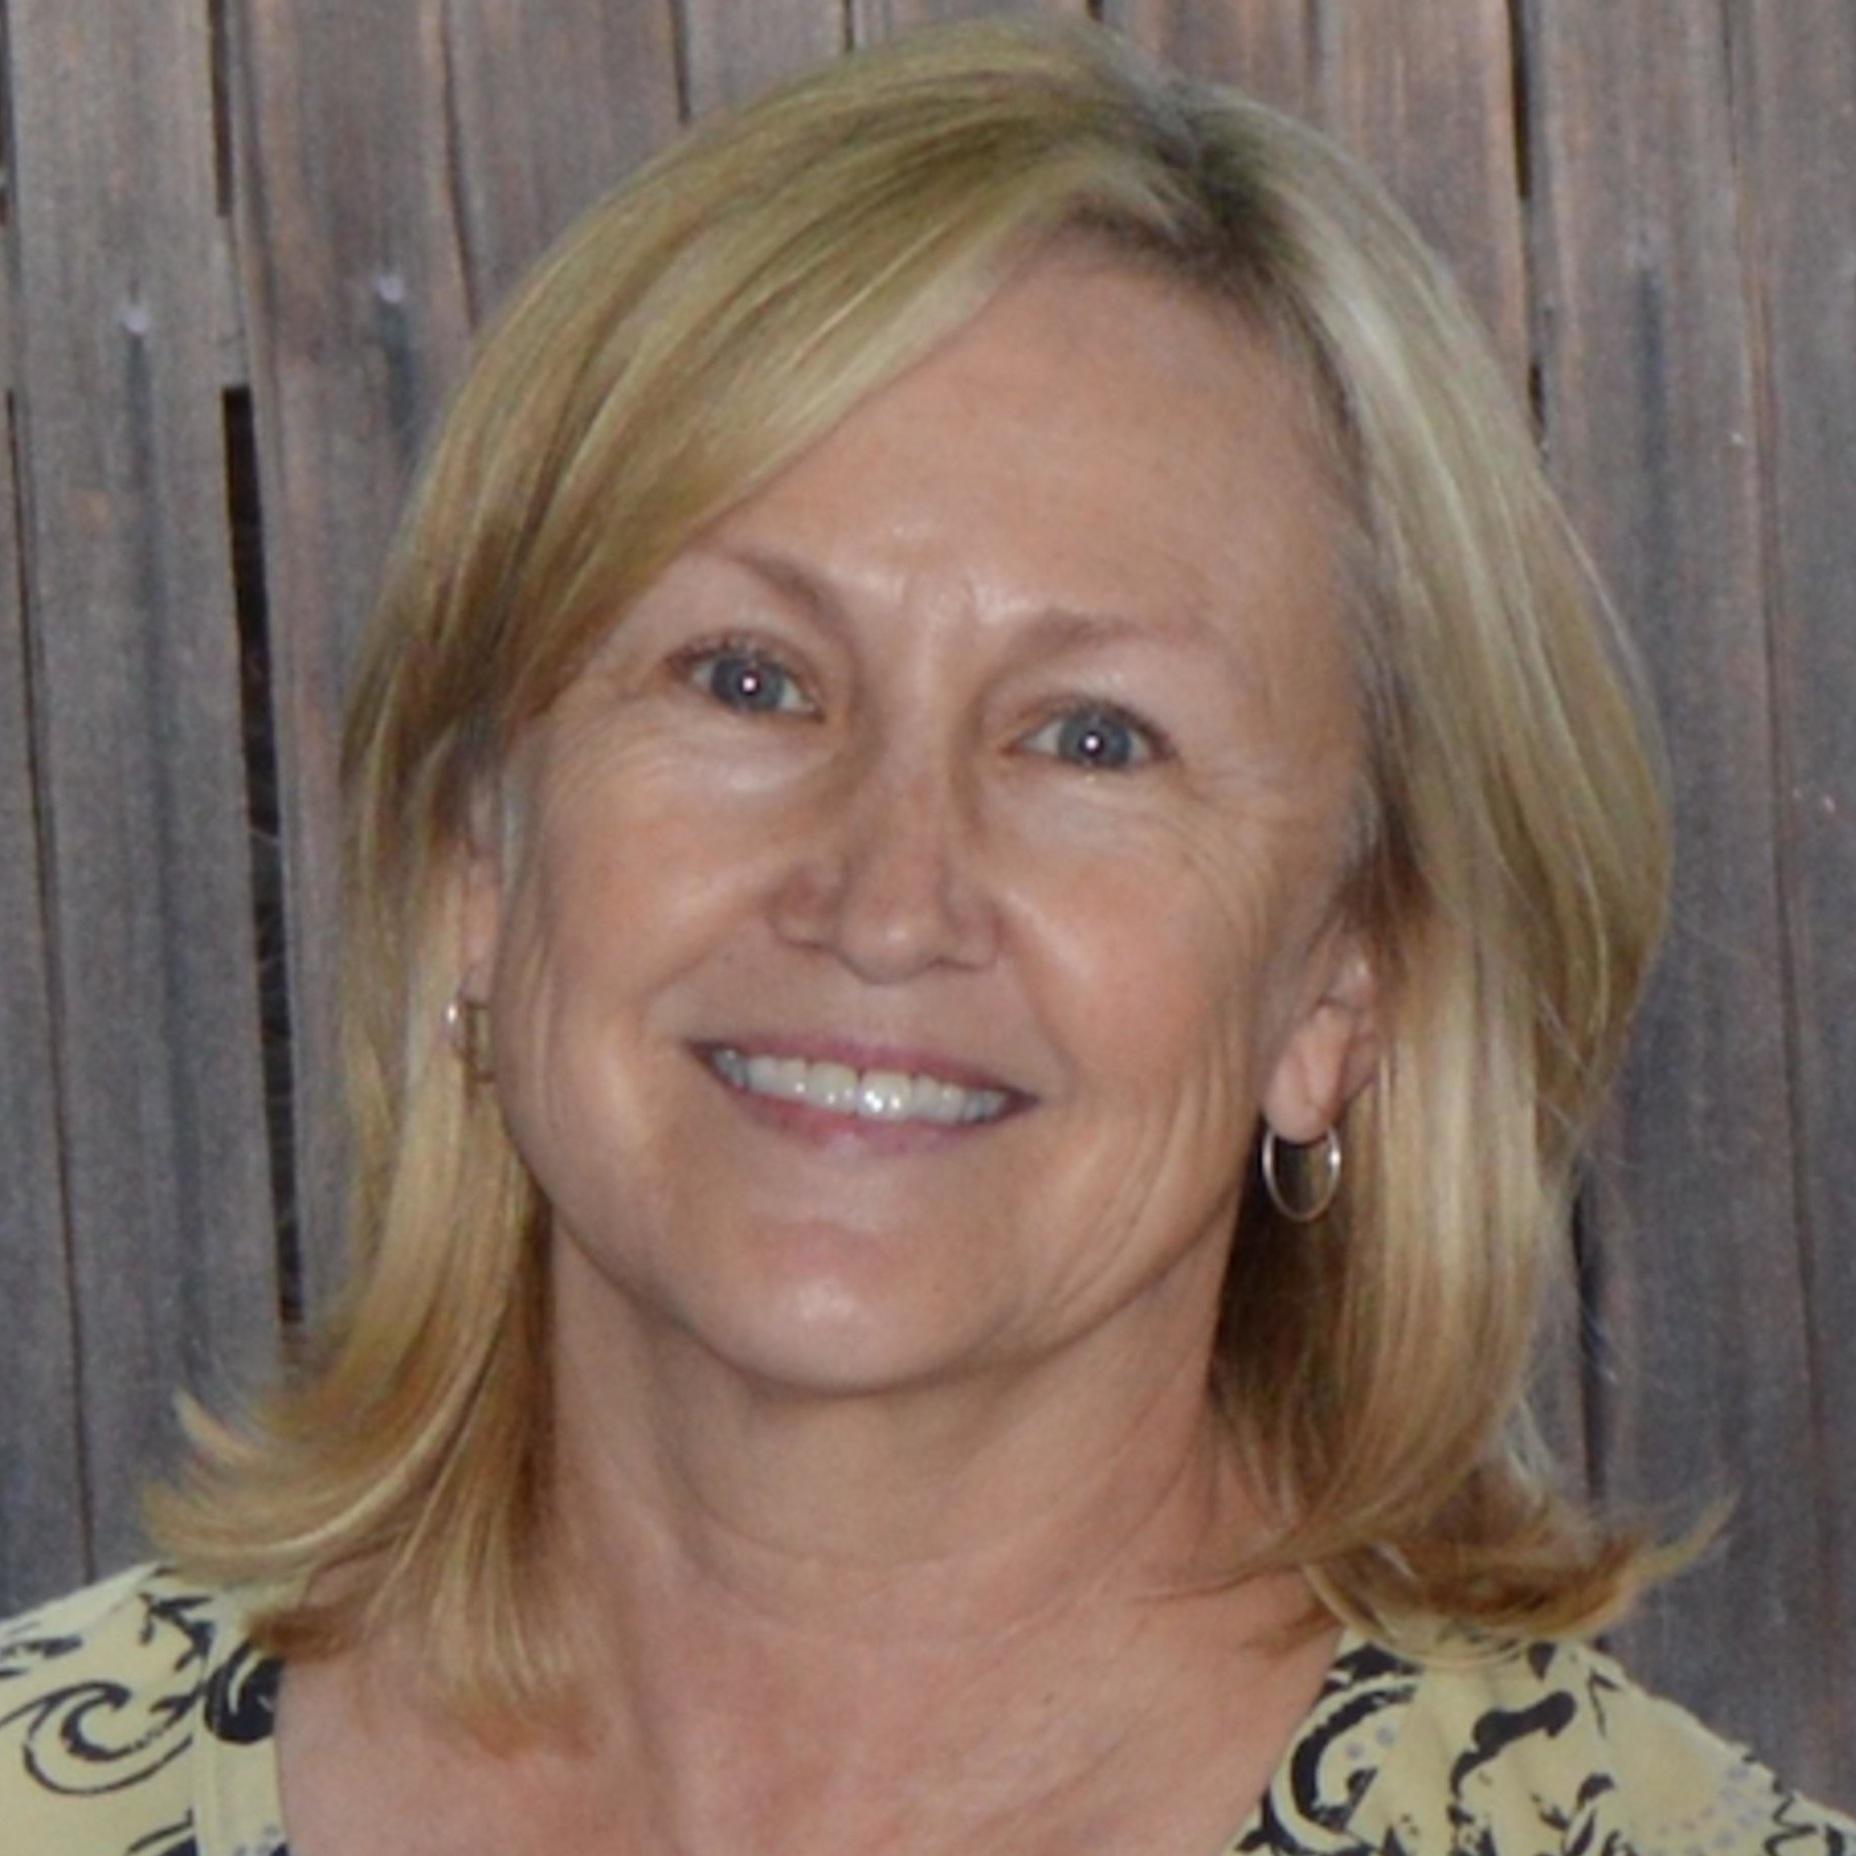 Bay Area District Member At Large  Karen Mays   klmays@aol.com